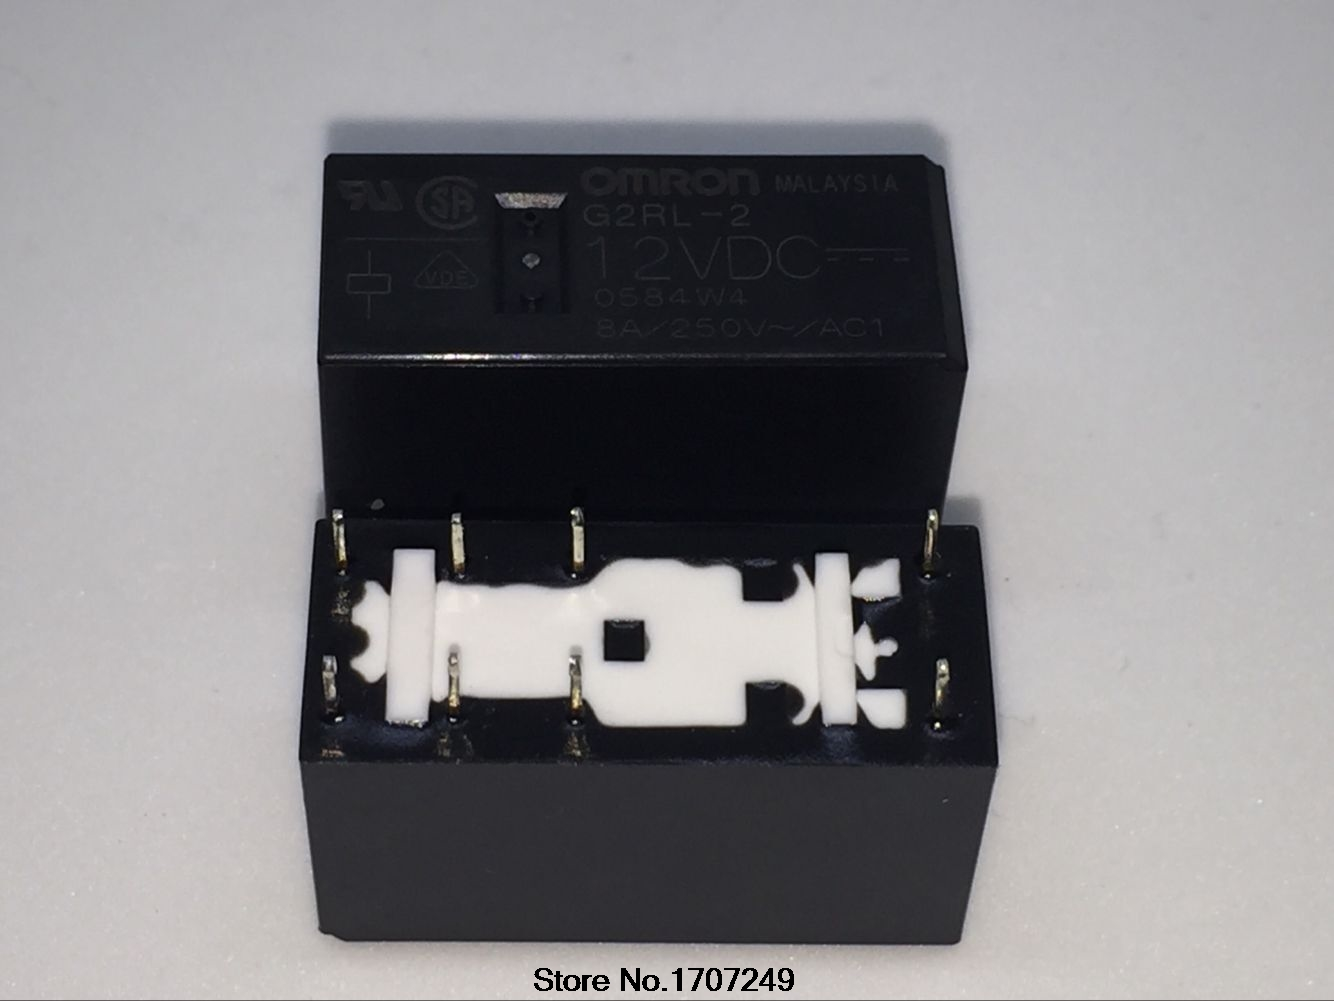 New 5pcs OMRON G2R-2-SN 24VDC RELAY 8-PIN